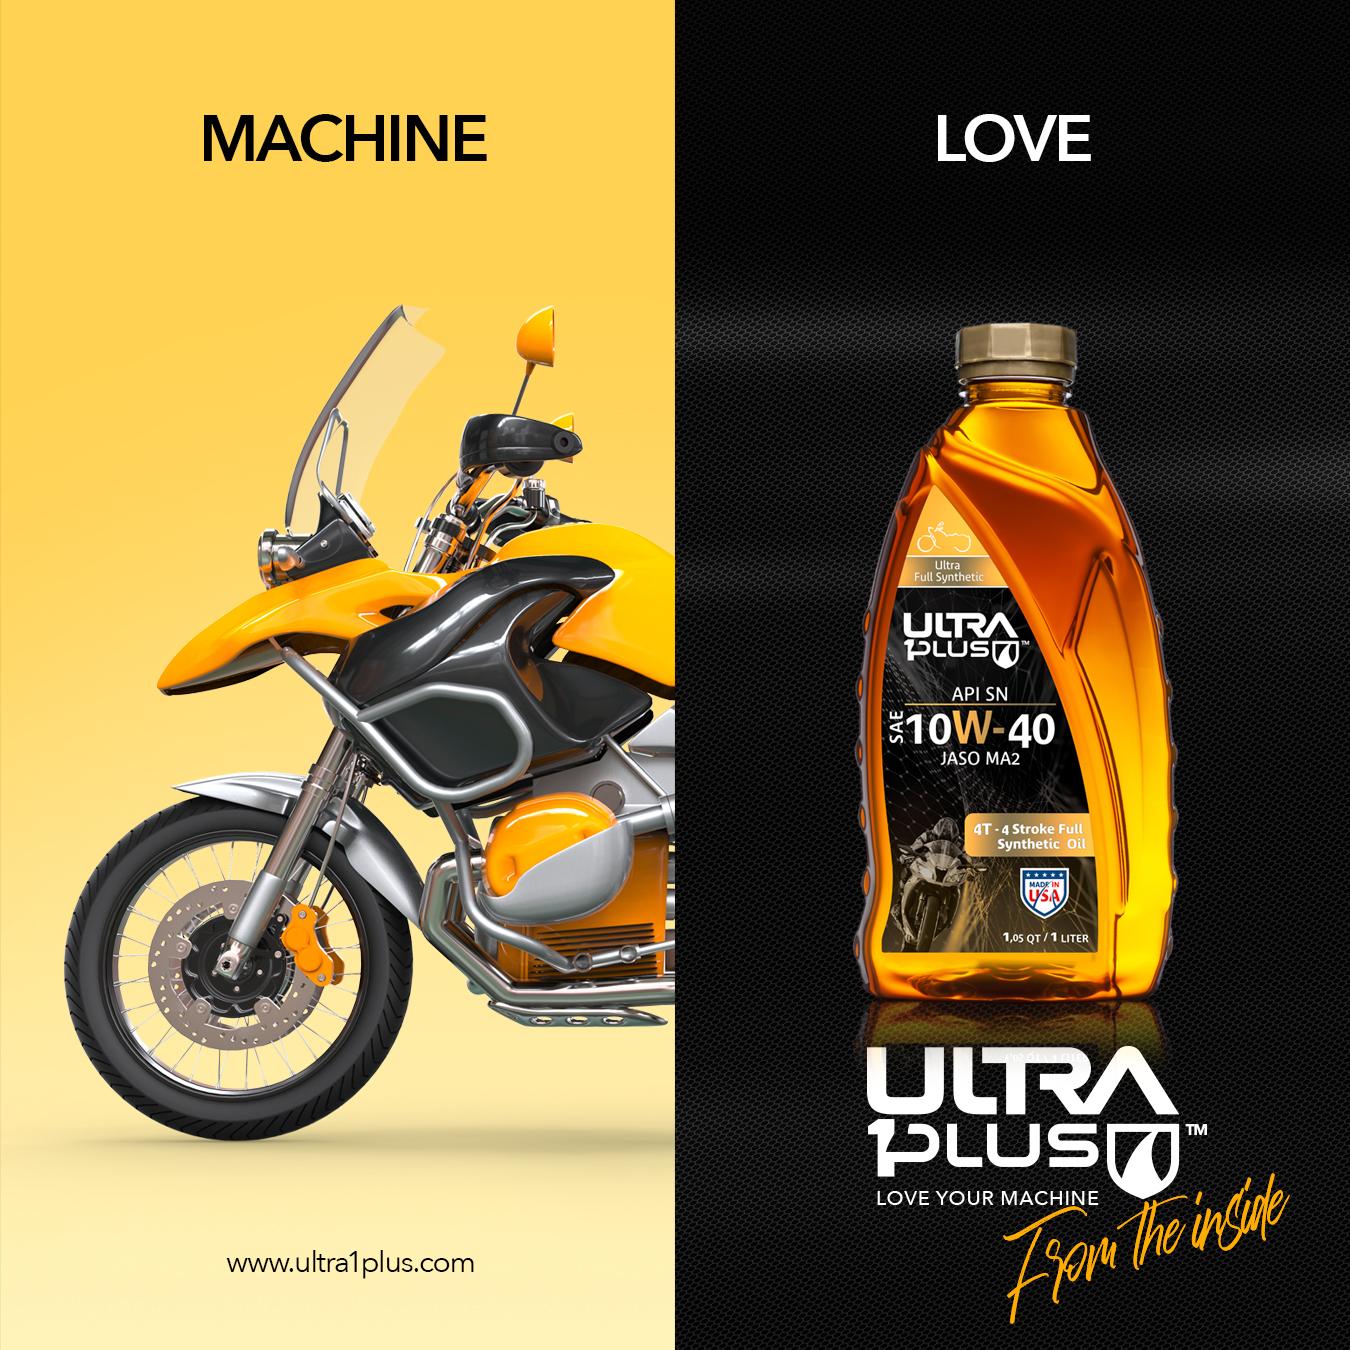 w02-004-prod-moto-love1.jpg